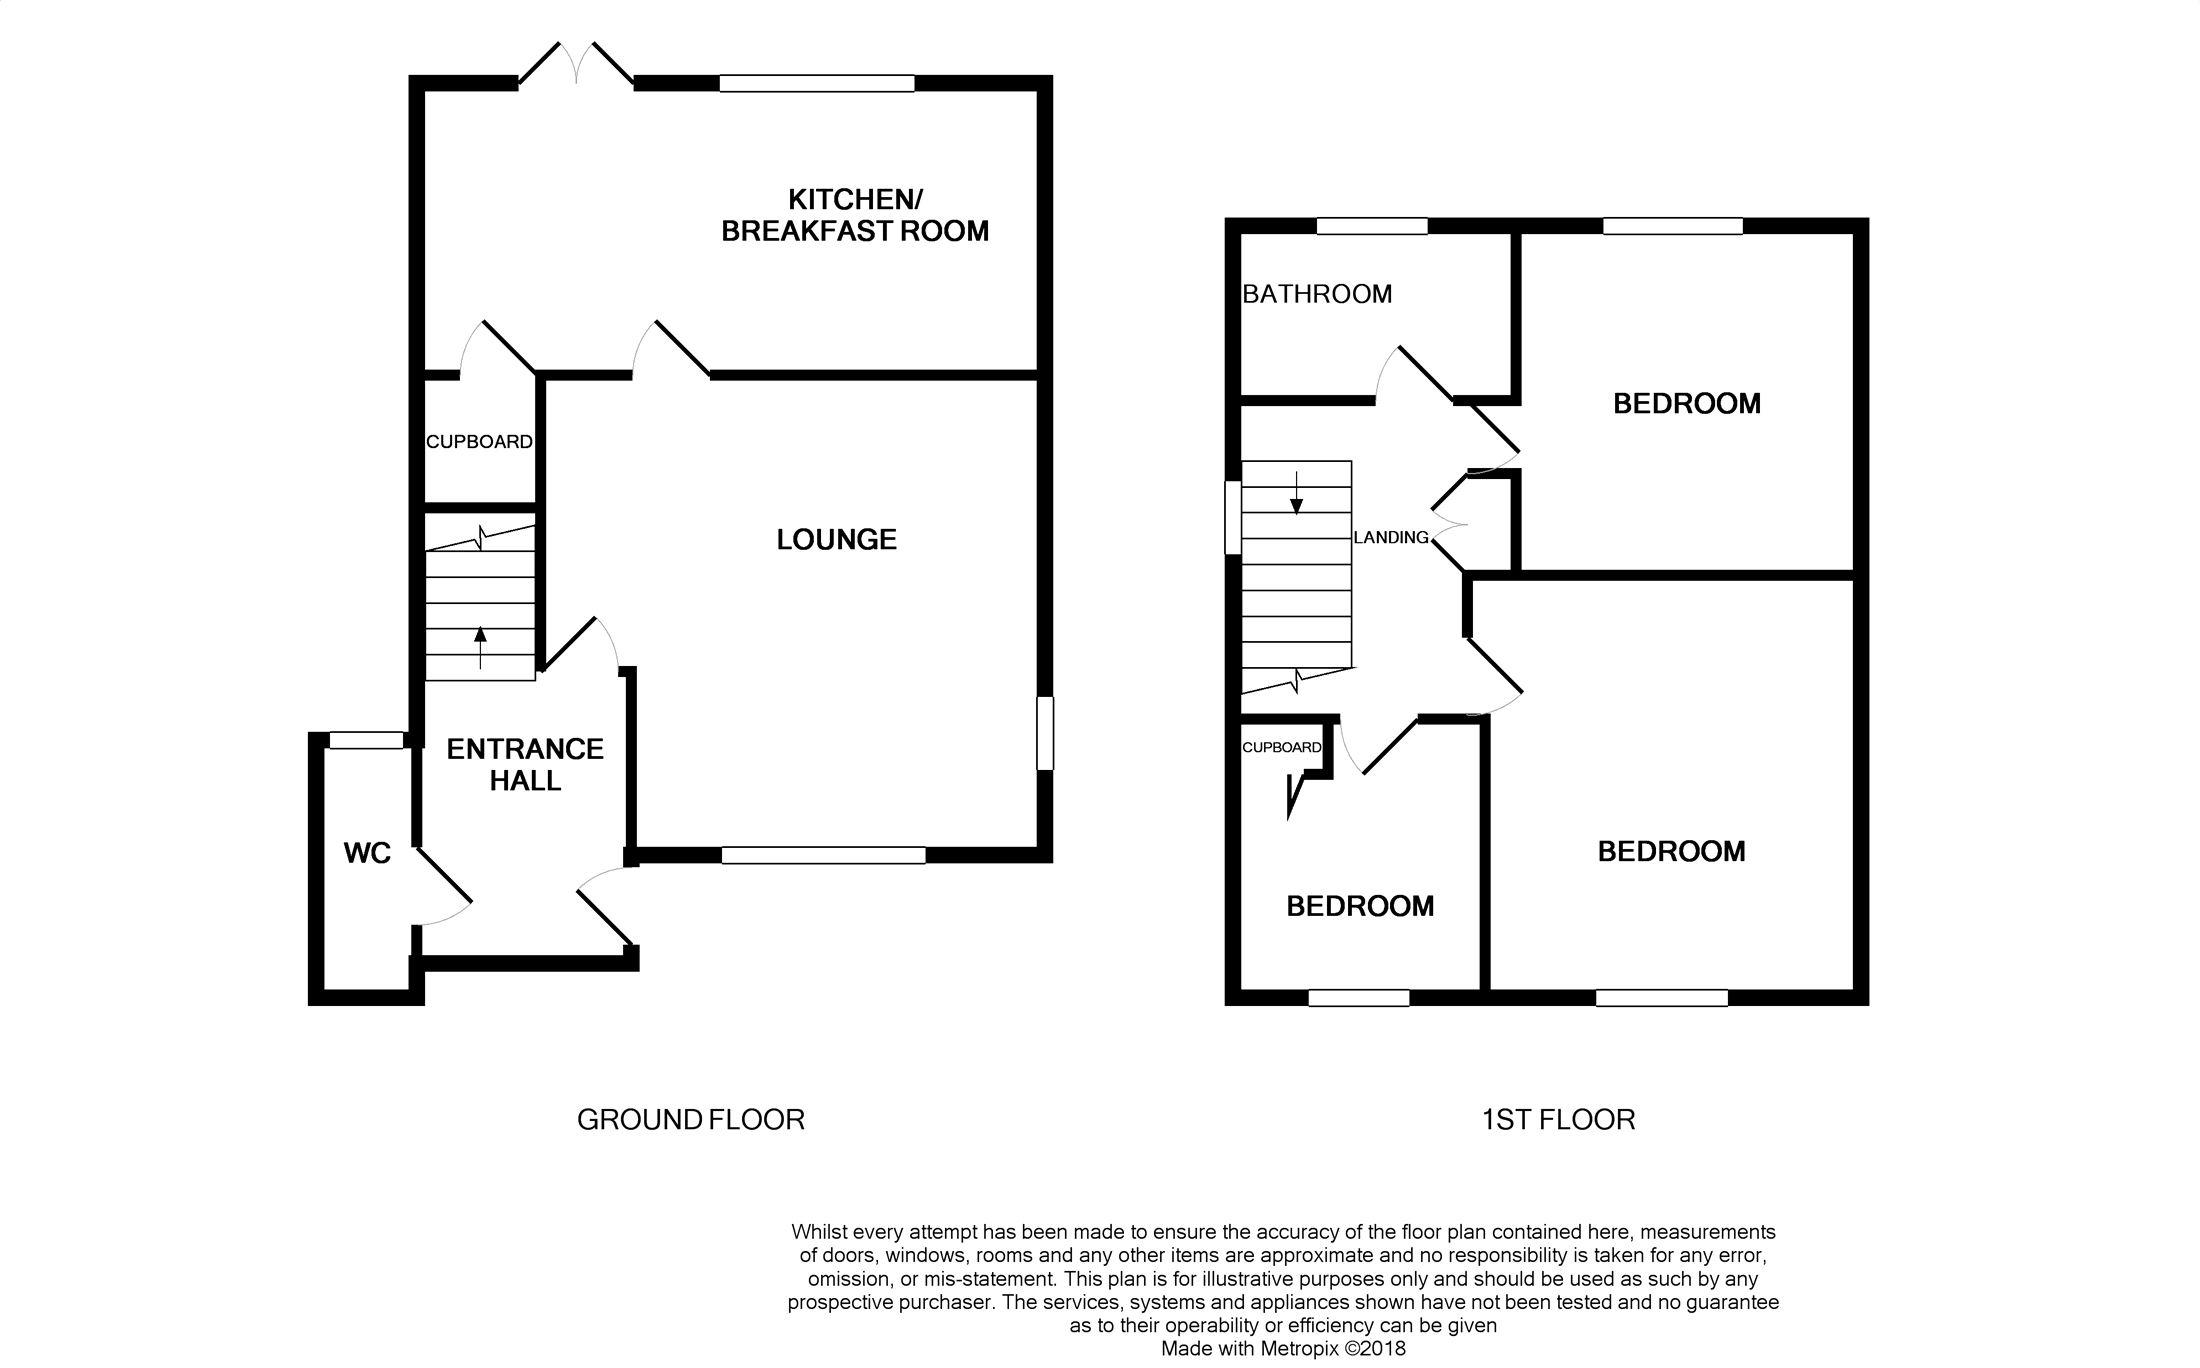 3 bedroom detached house for sale in oulton broad nr32